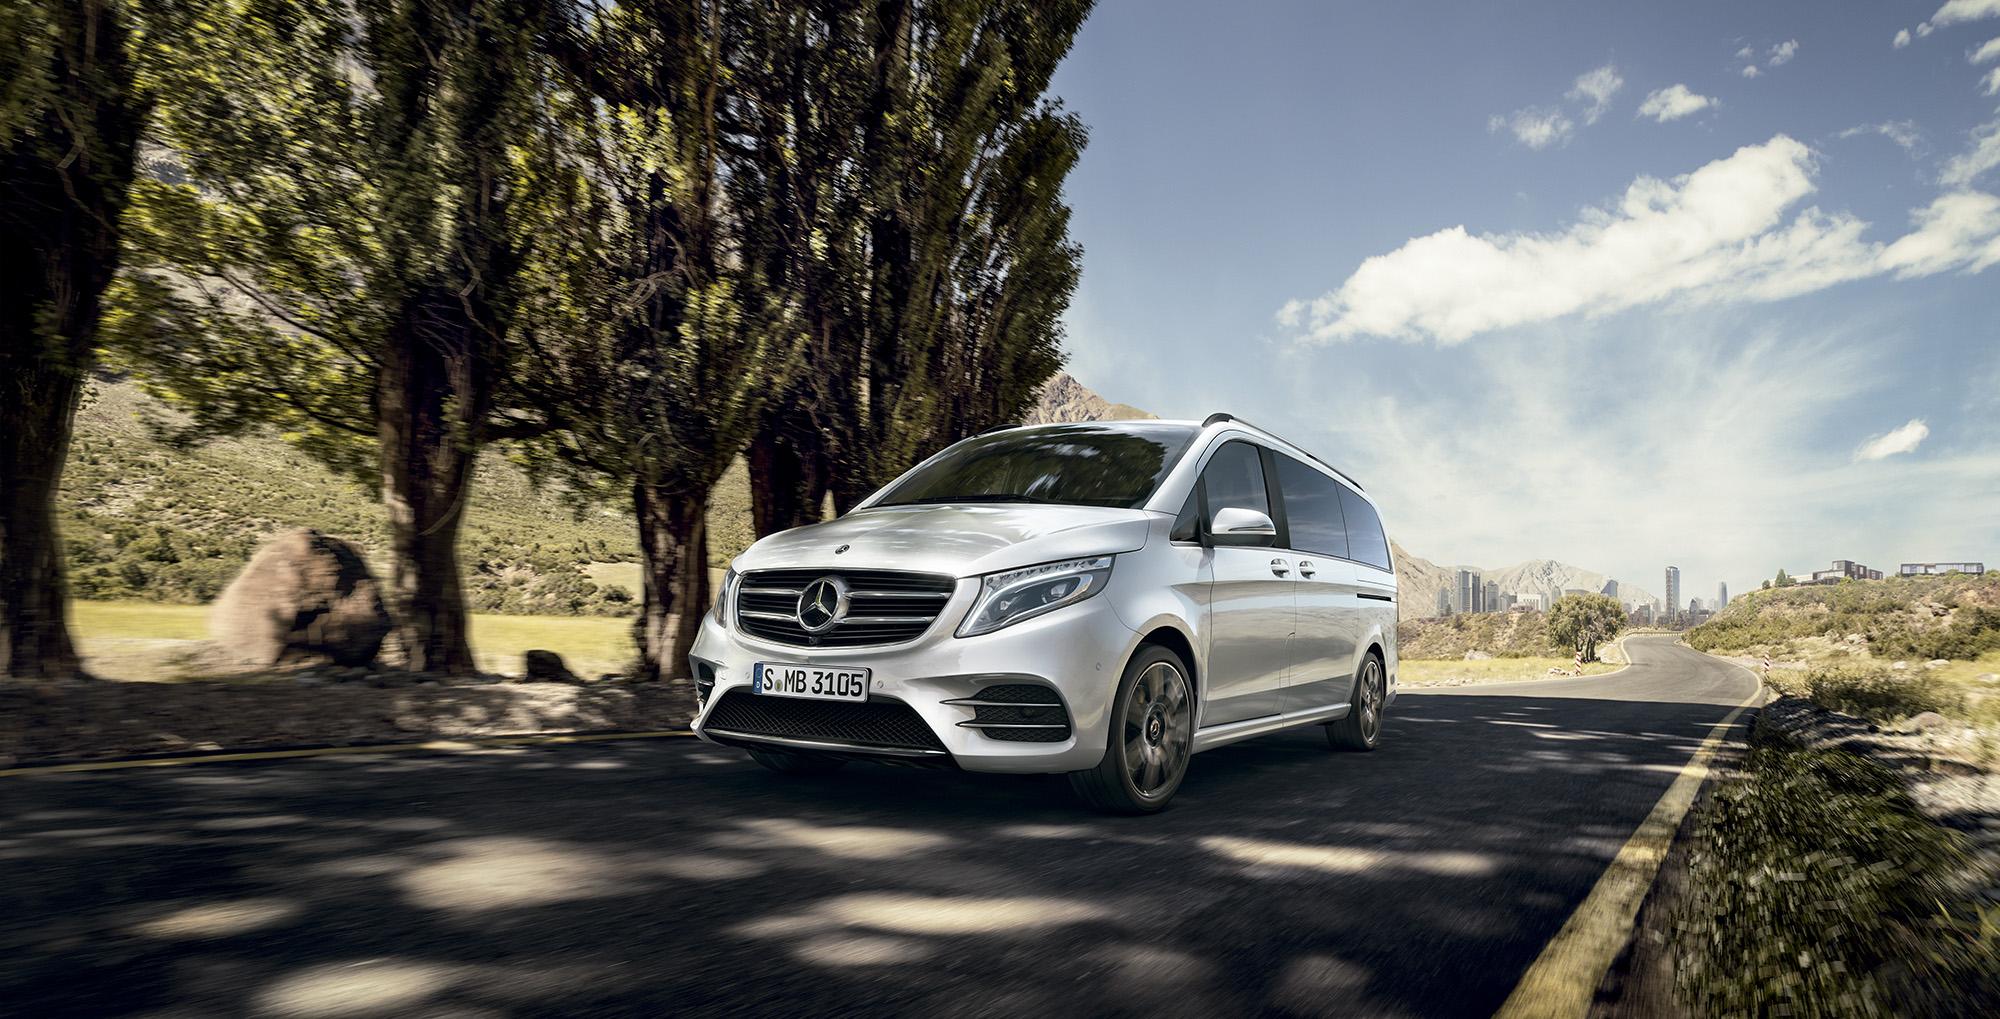 Furgoneta Mercedes-Benz Clase V Concesur Sevilla